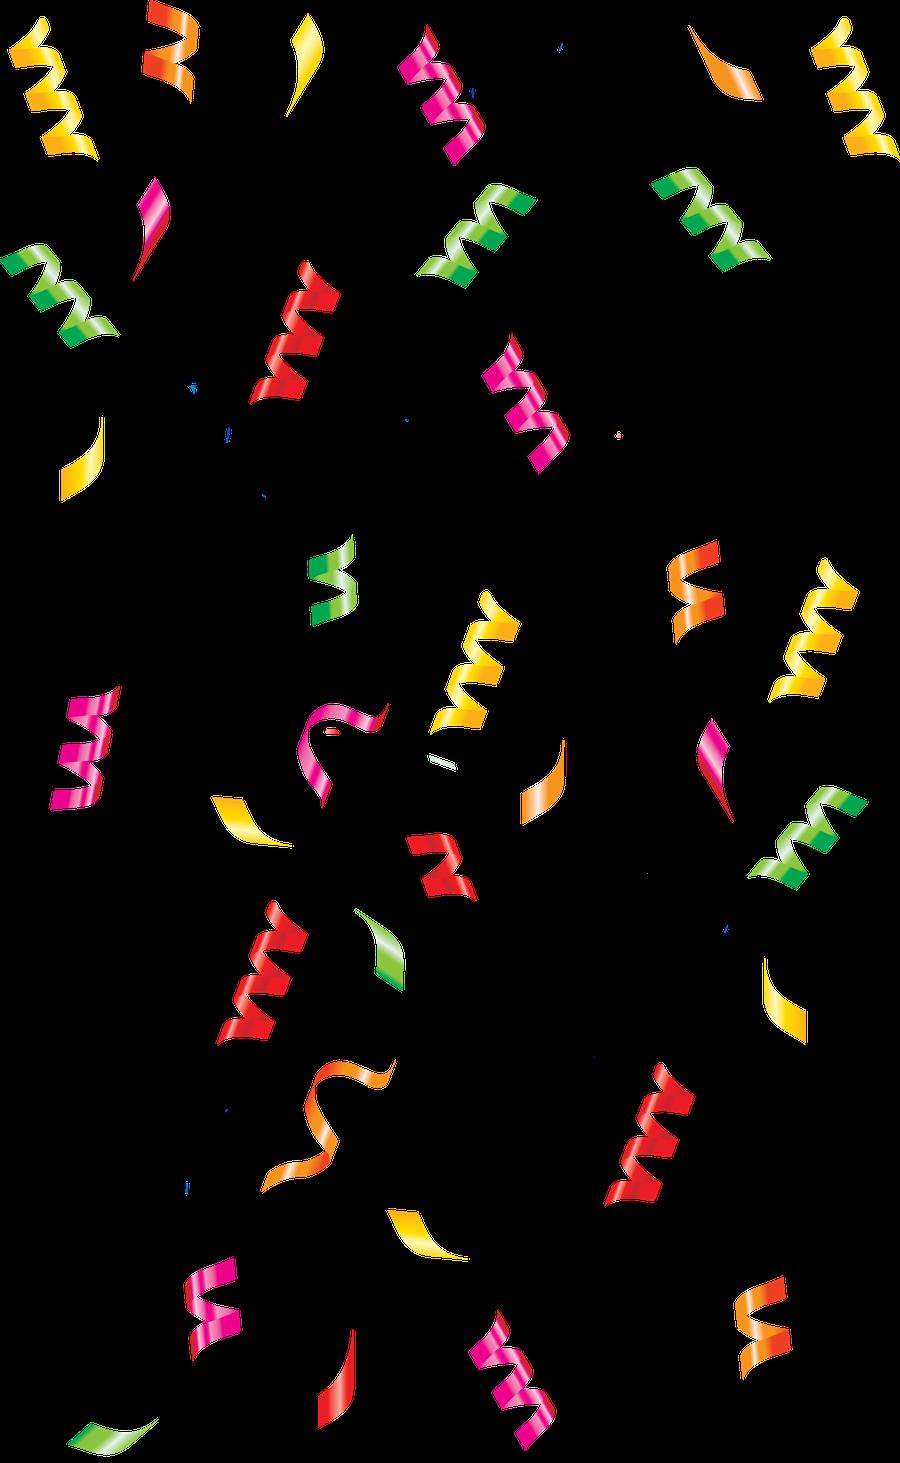 medium resolution of confetti paper confetti celebration clip art birthday images happy name day